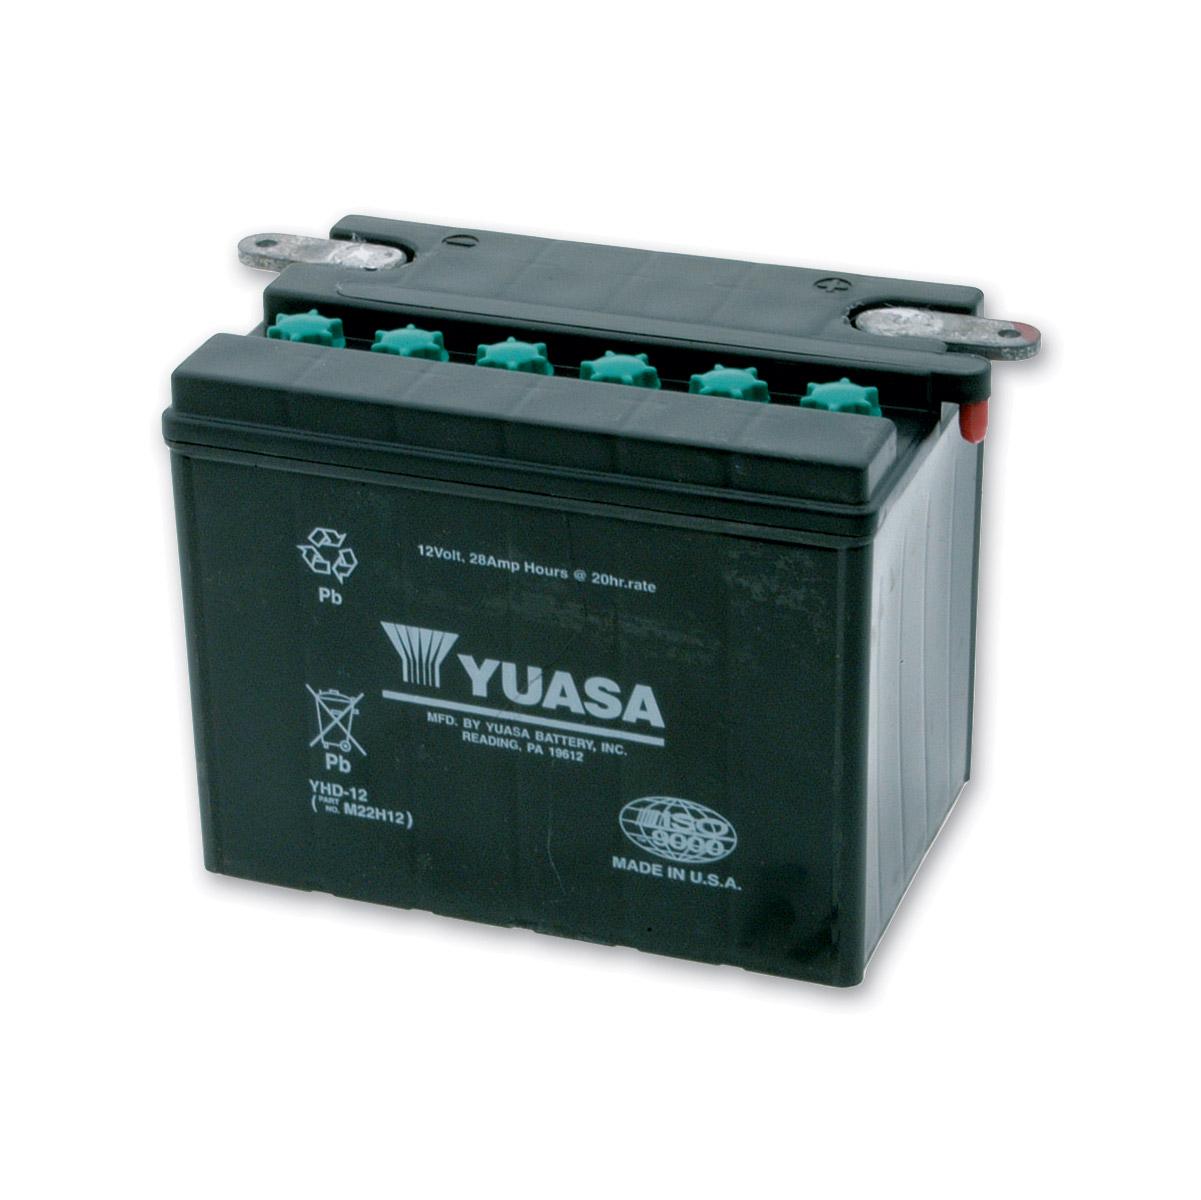 Yuasa Harley-Davidson Electrical & Batteries | J&P Cycles